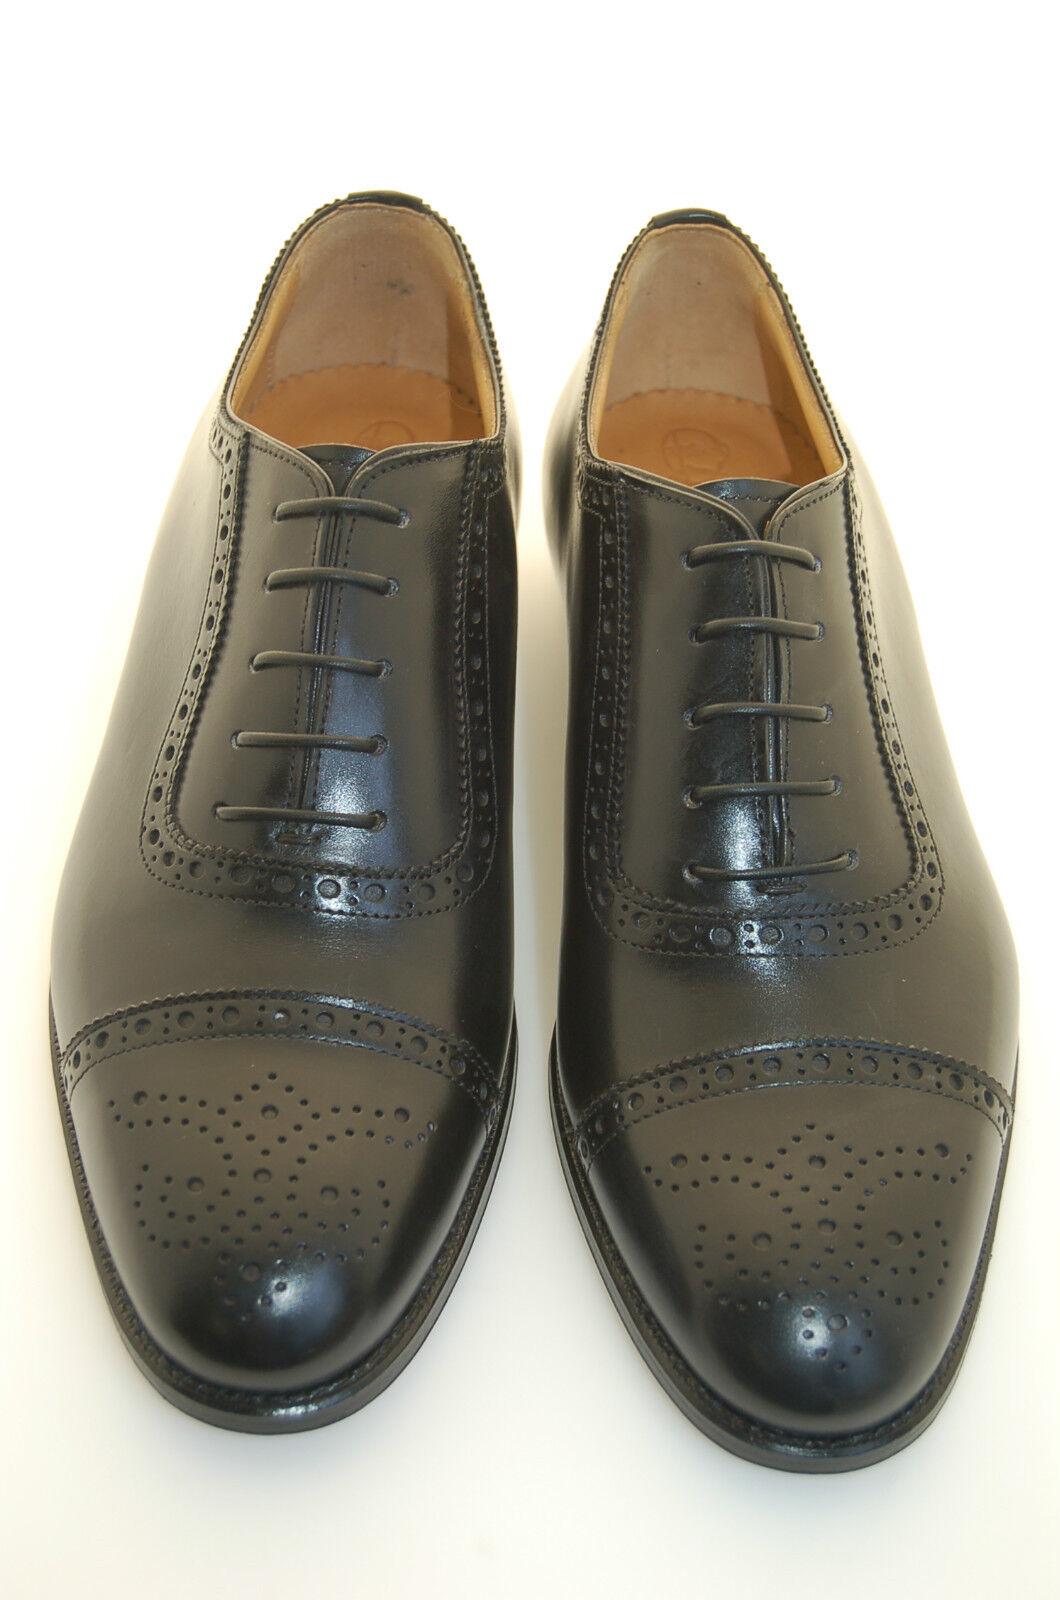 MAN MAN MAN - 39 - 5eu - OXFORD CAPTOE PERFS & MED- schwarz CALF-LEATHER SOLE BLAKE CSTR. 0fa808